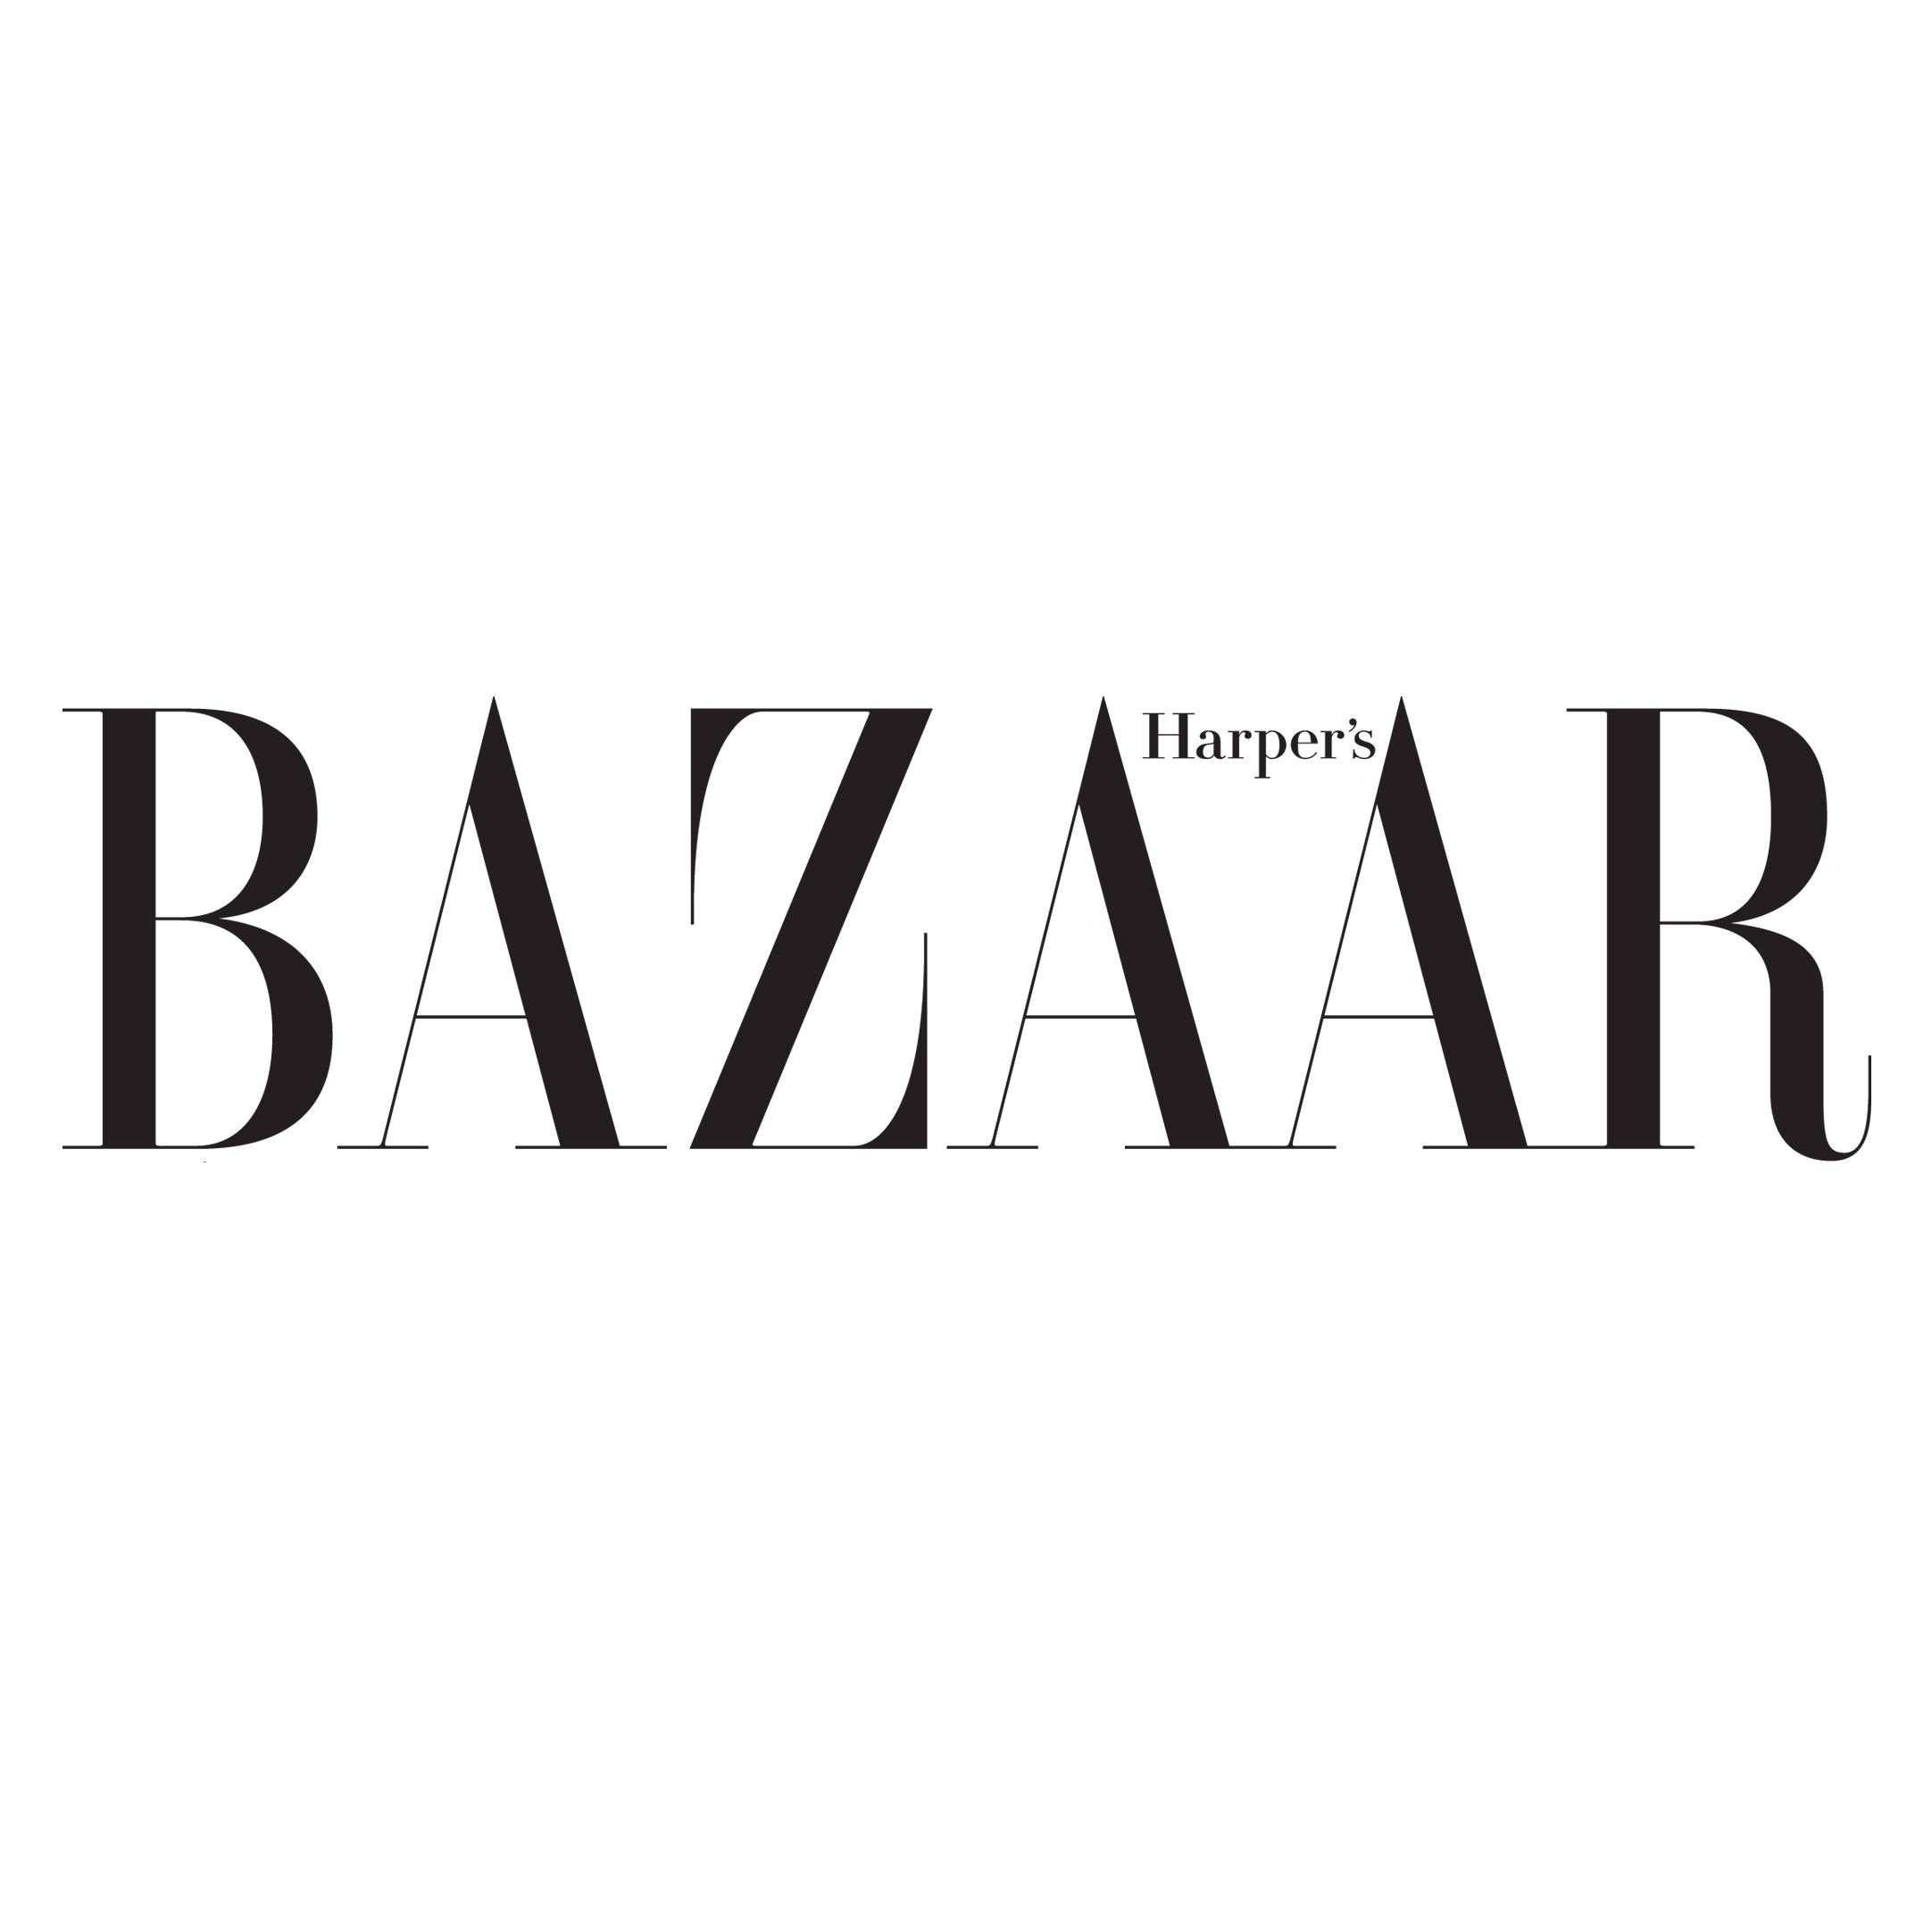 Victory Club in Harper's Bazaar